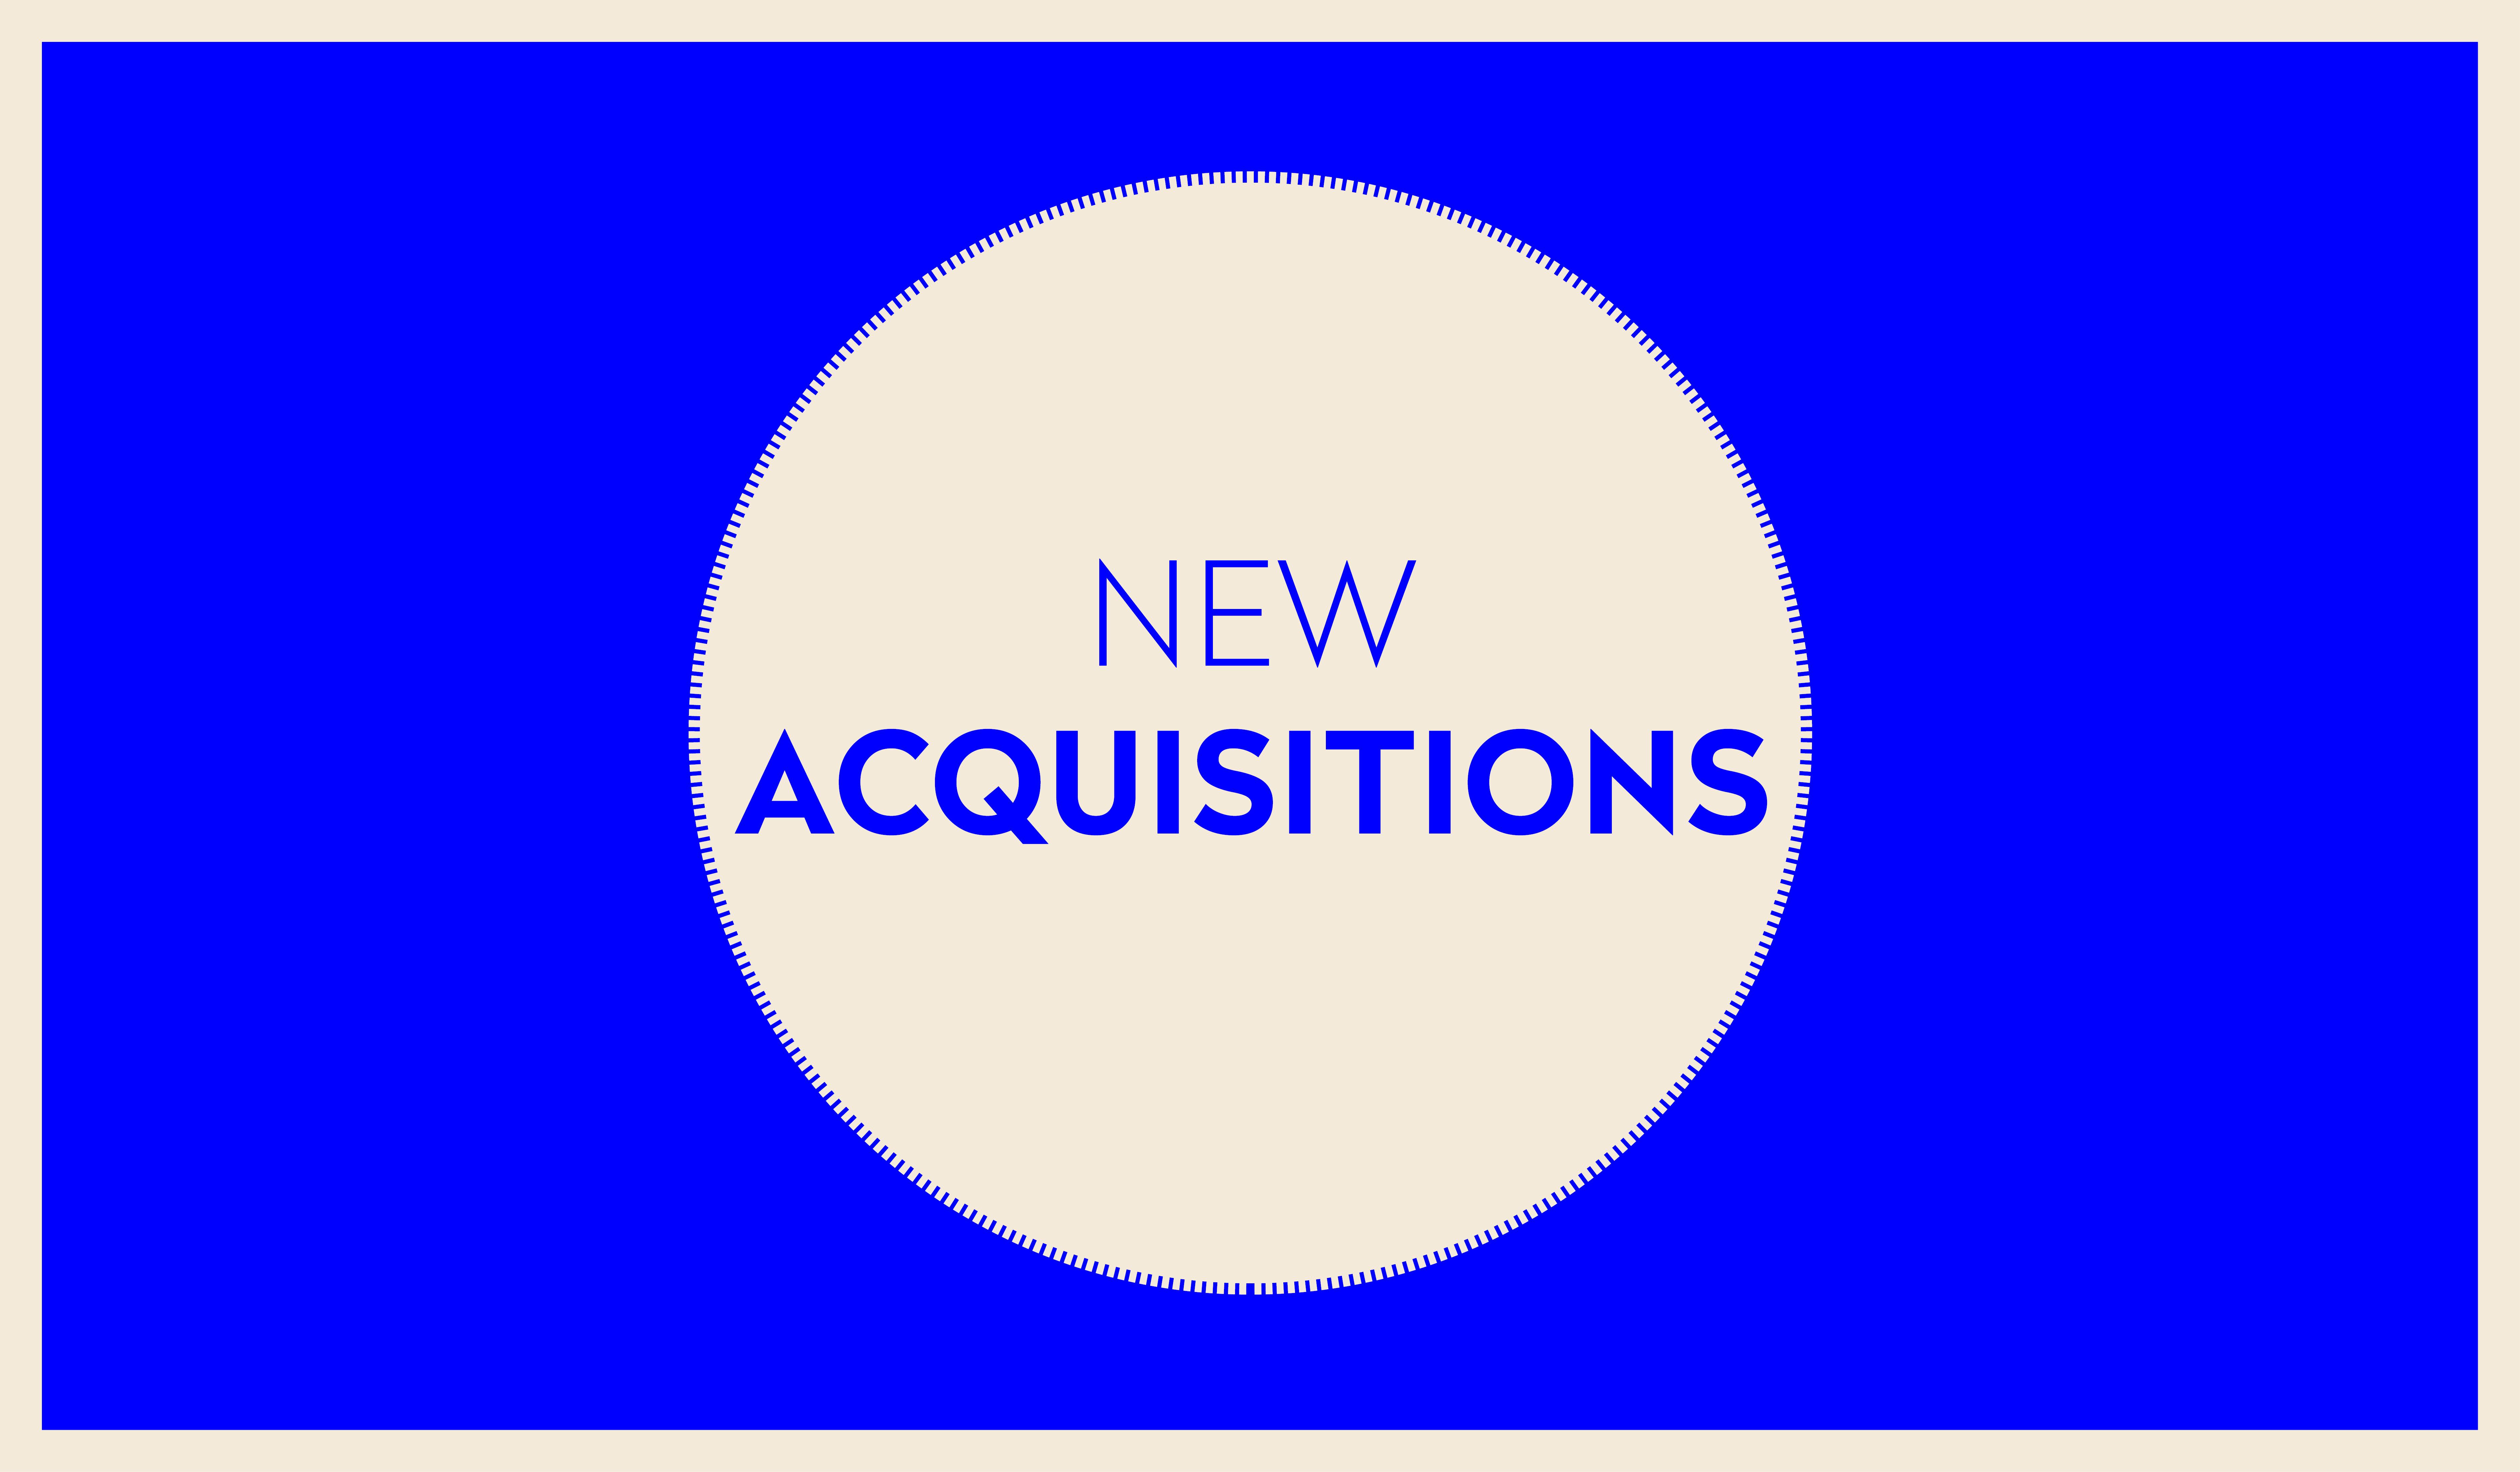 NEW ACQUISITIONS | OCTOBRE 2019 ★ 2